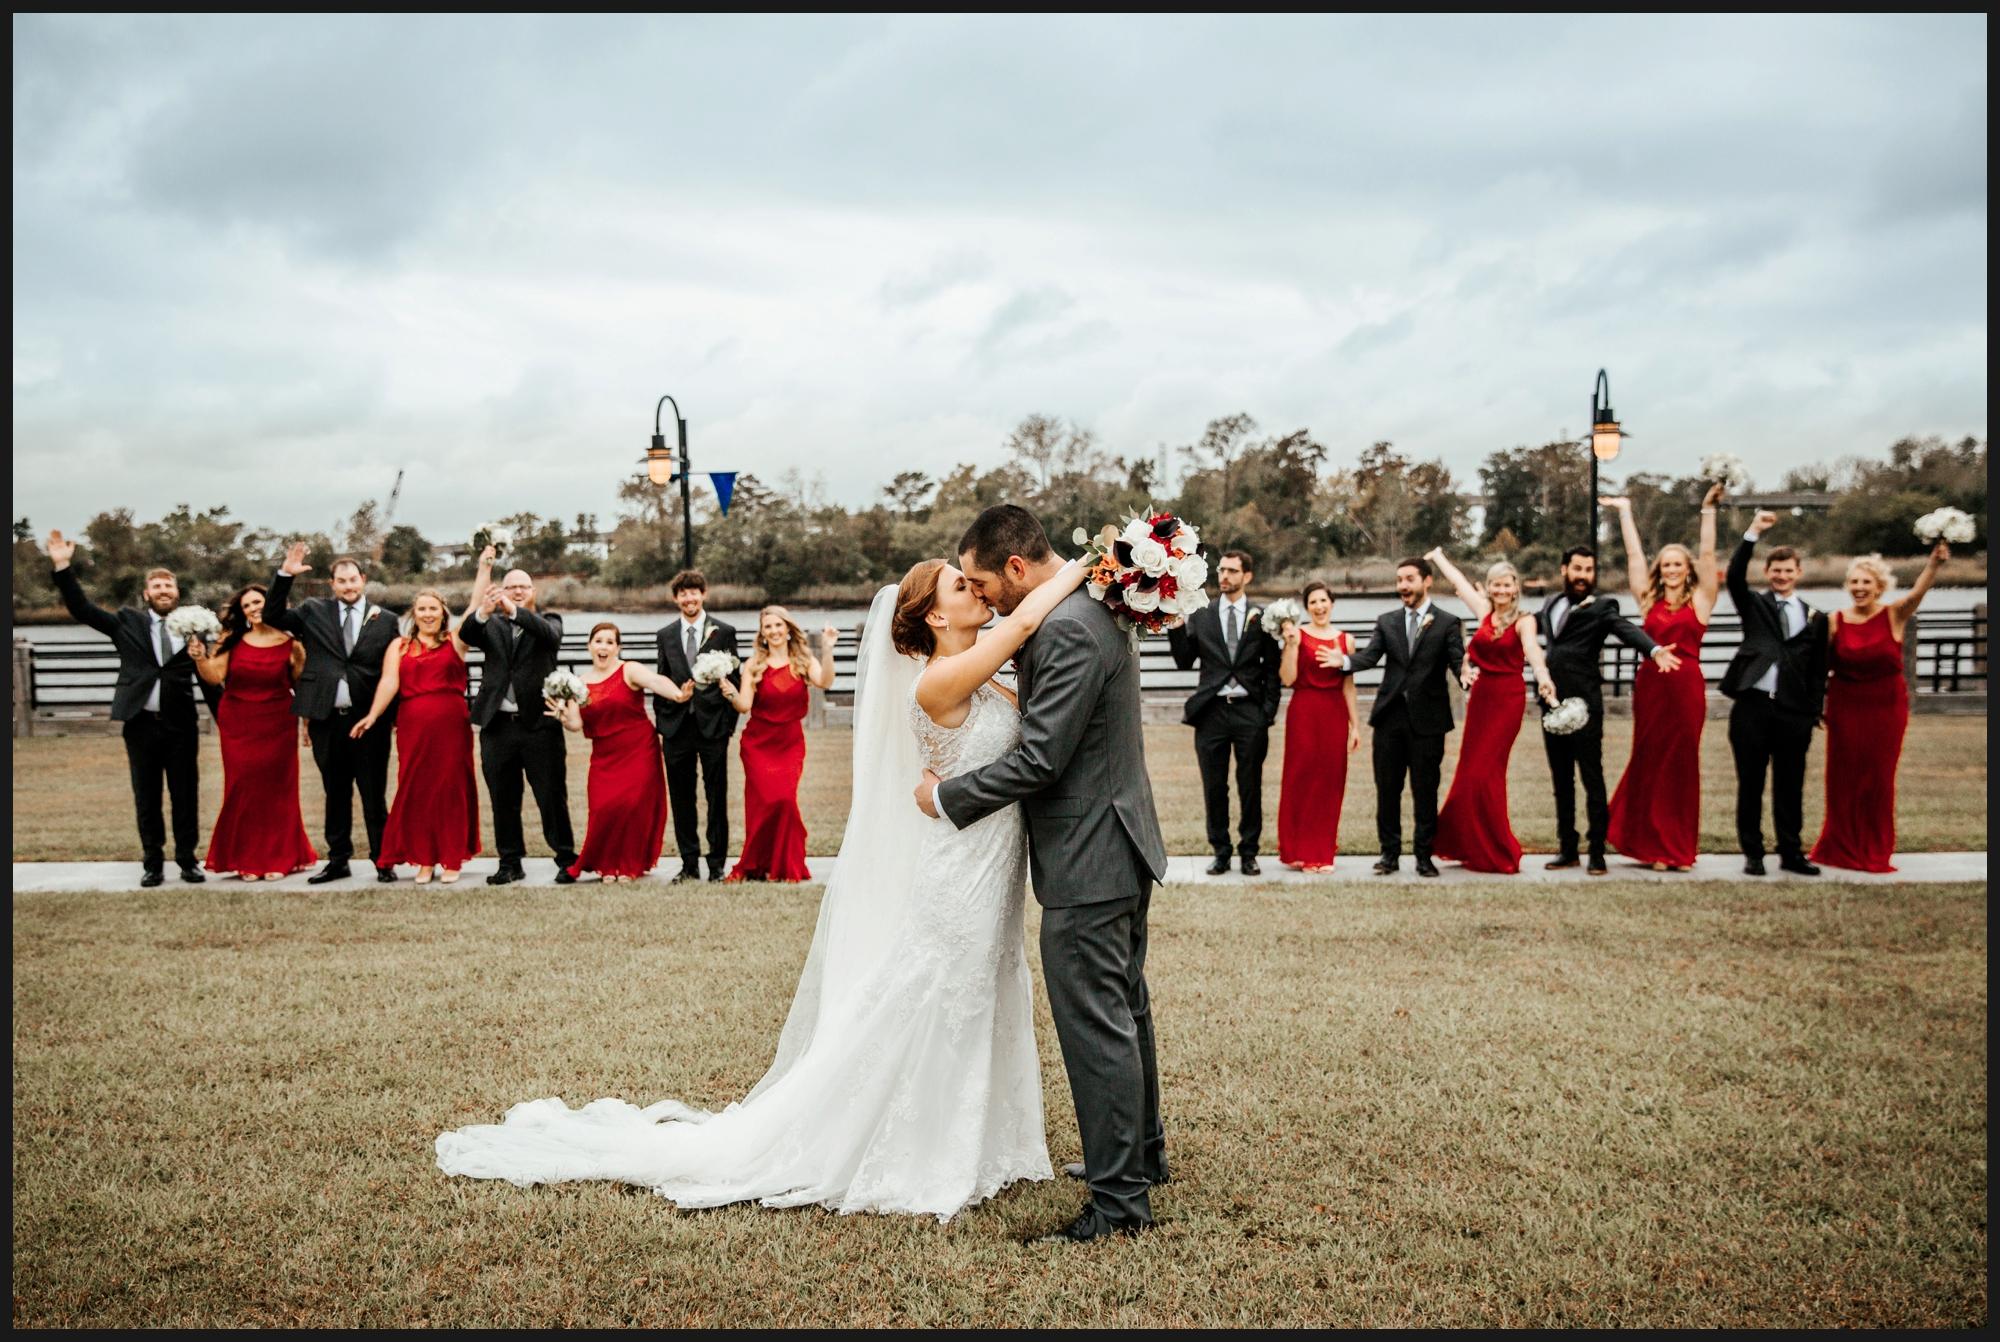 Orlando-Wedding-Photographer-destination-wedding-photographer-florida-wedding-photographer-bohemian-wedding-photographer_0633.jpg